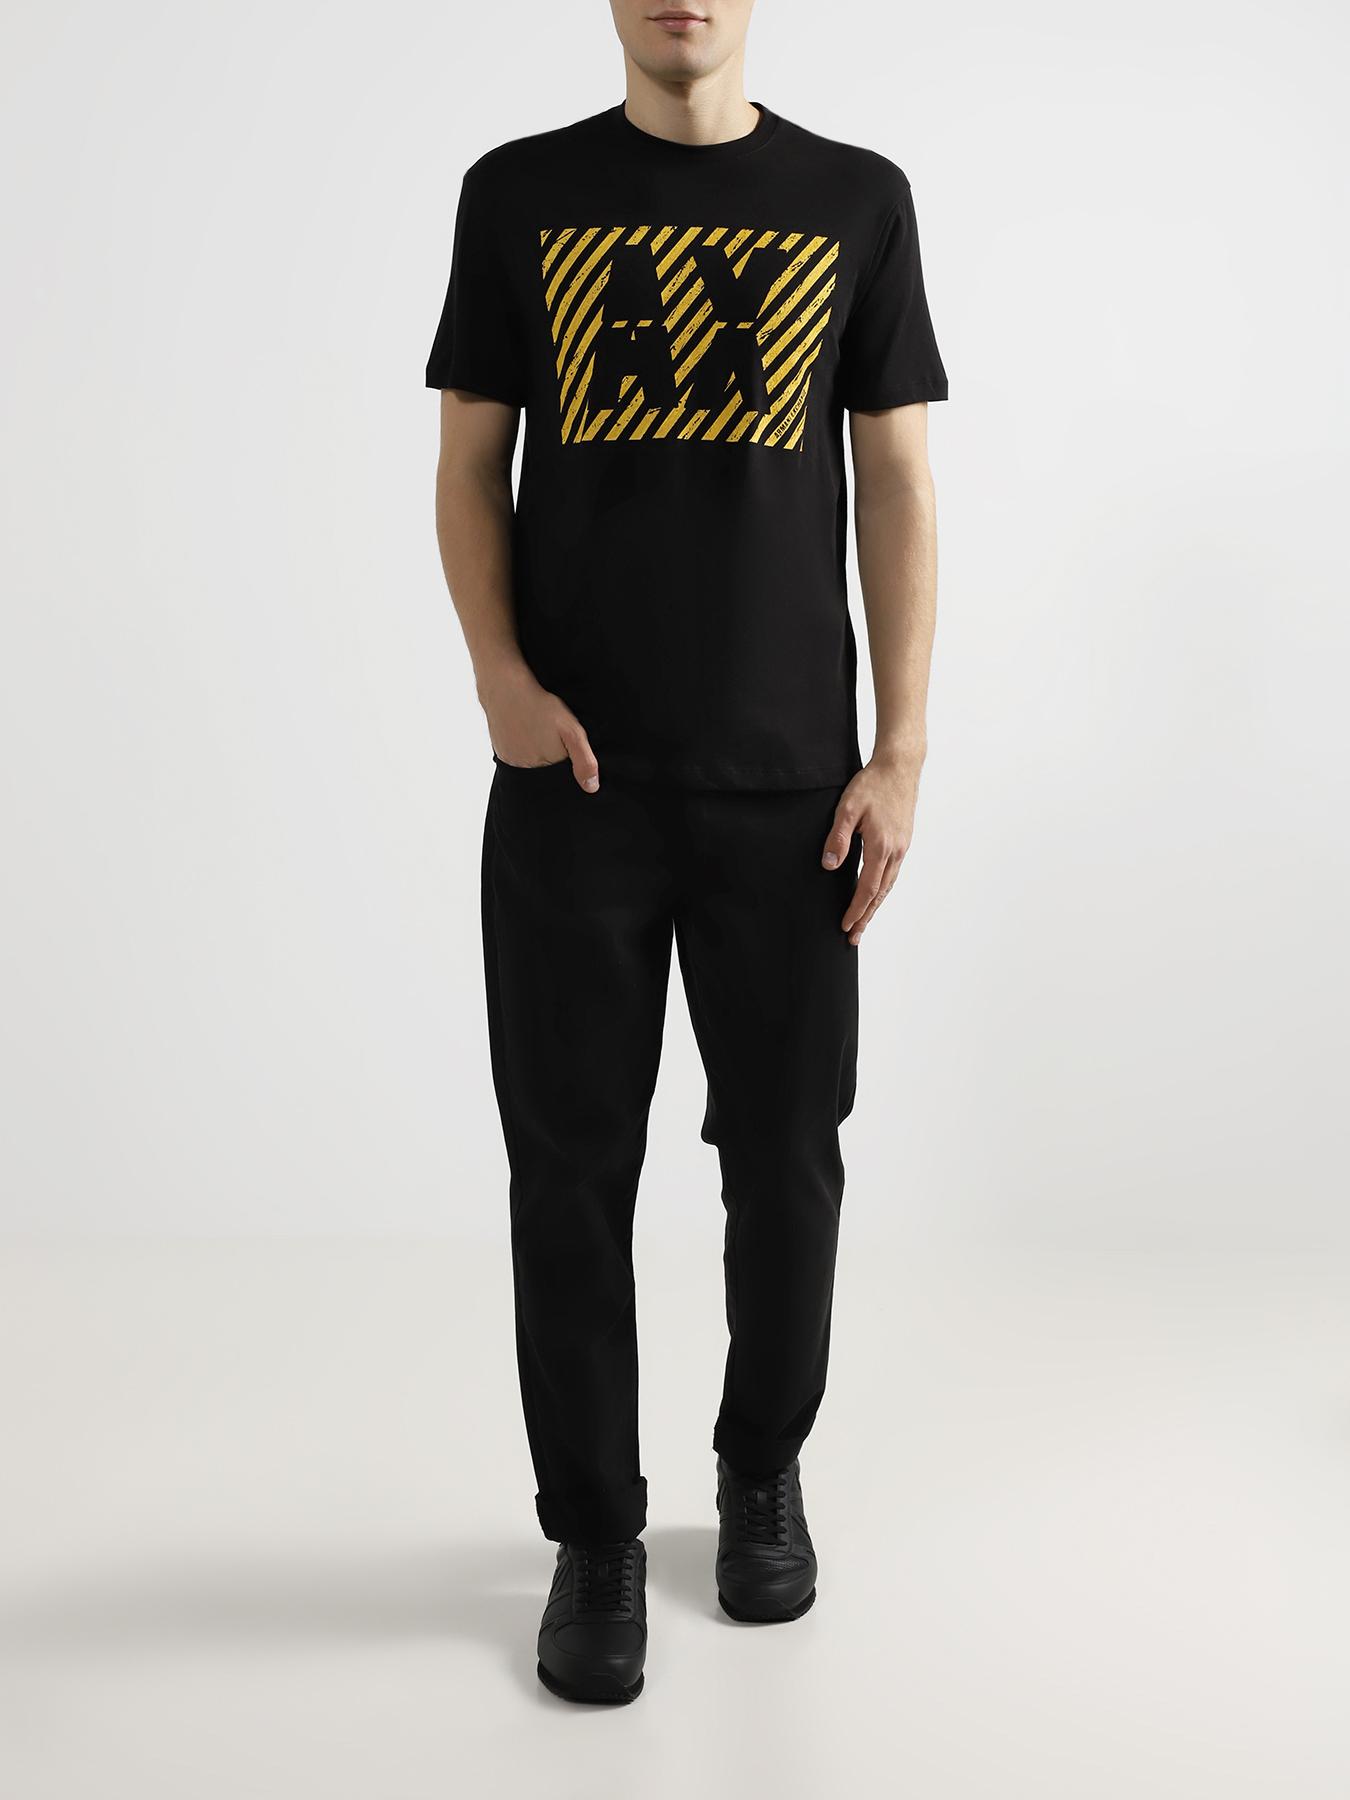 Фуфайка Armani Exchange Мужская футболка